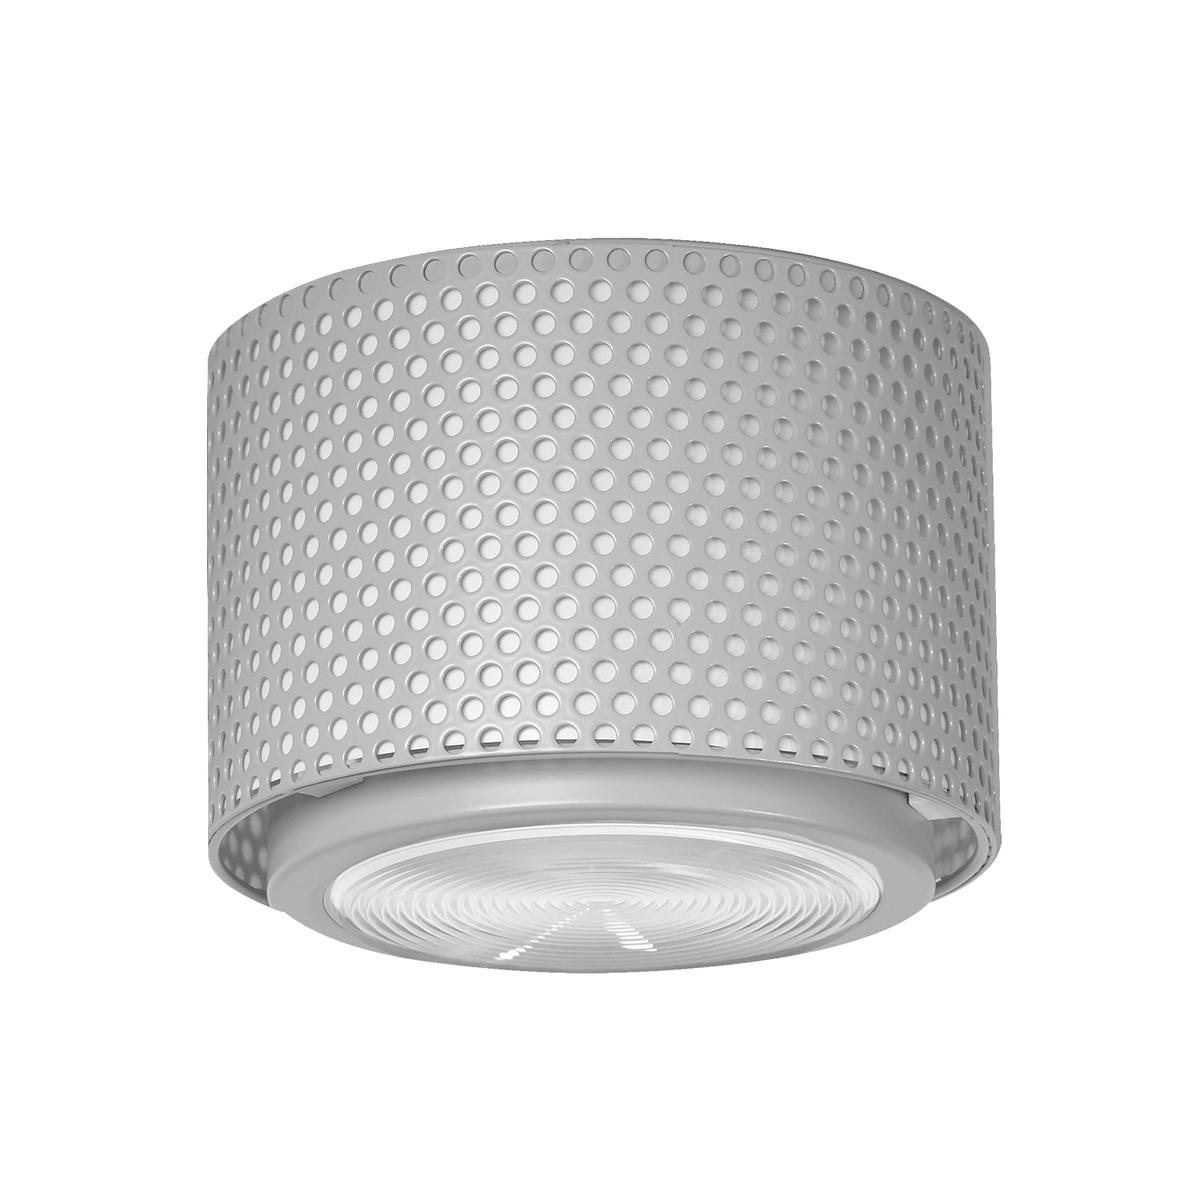 Sammode G13 Ceiling Lamp, Small, Grey